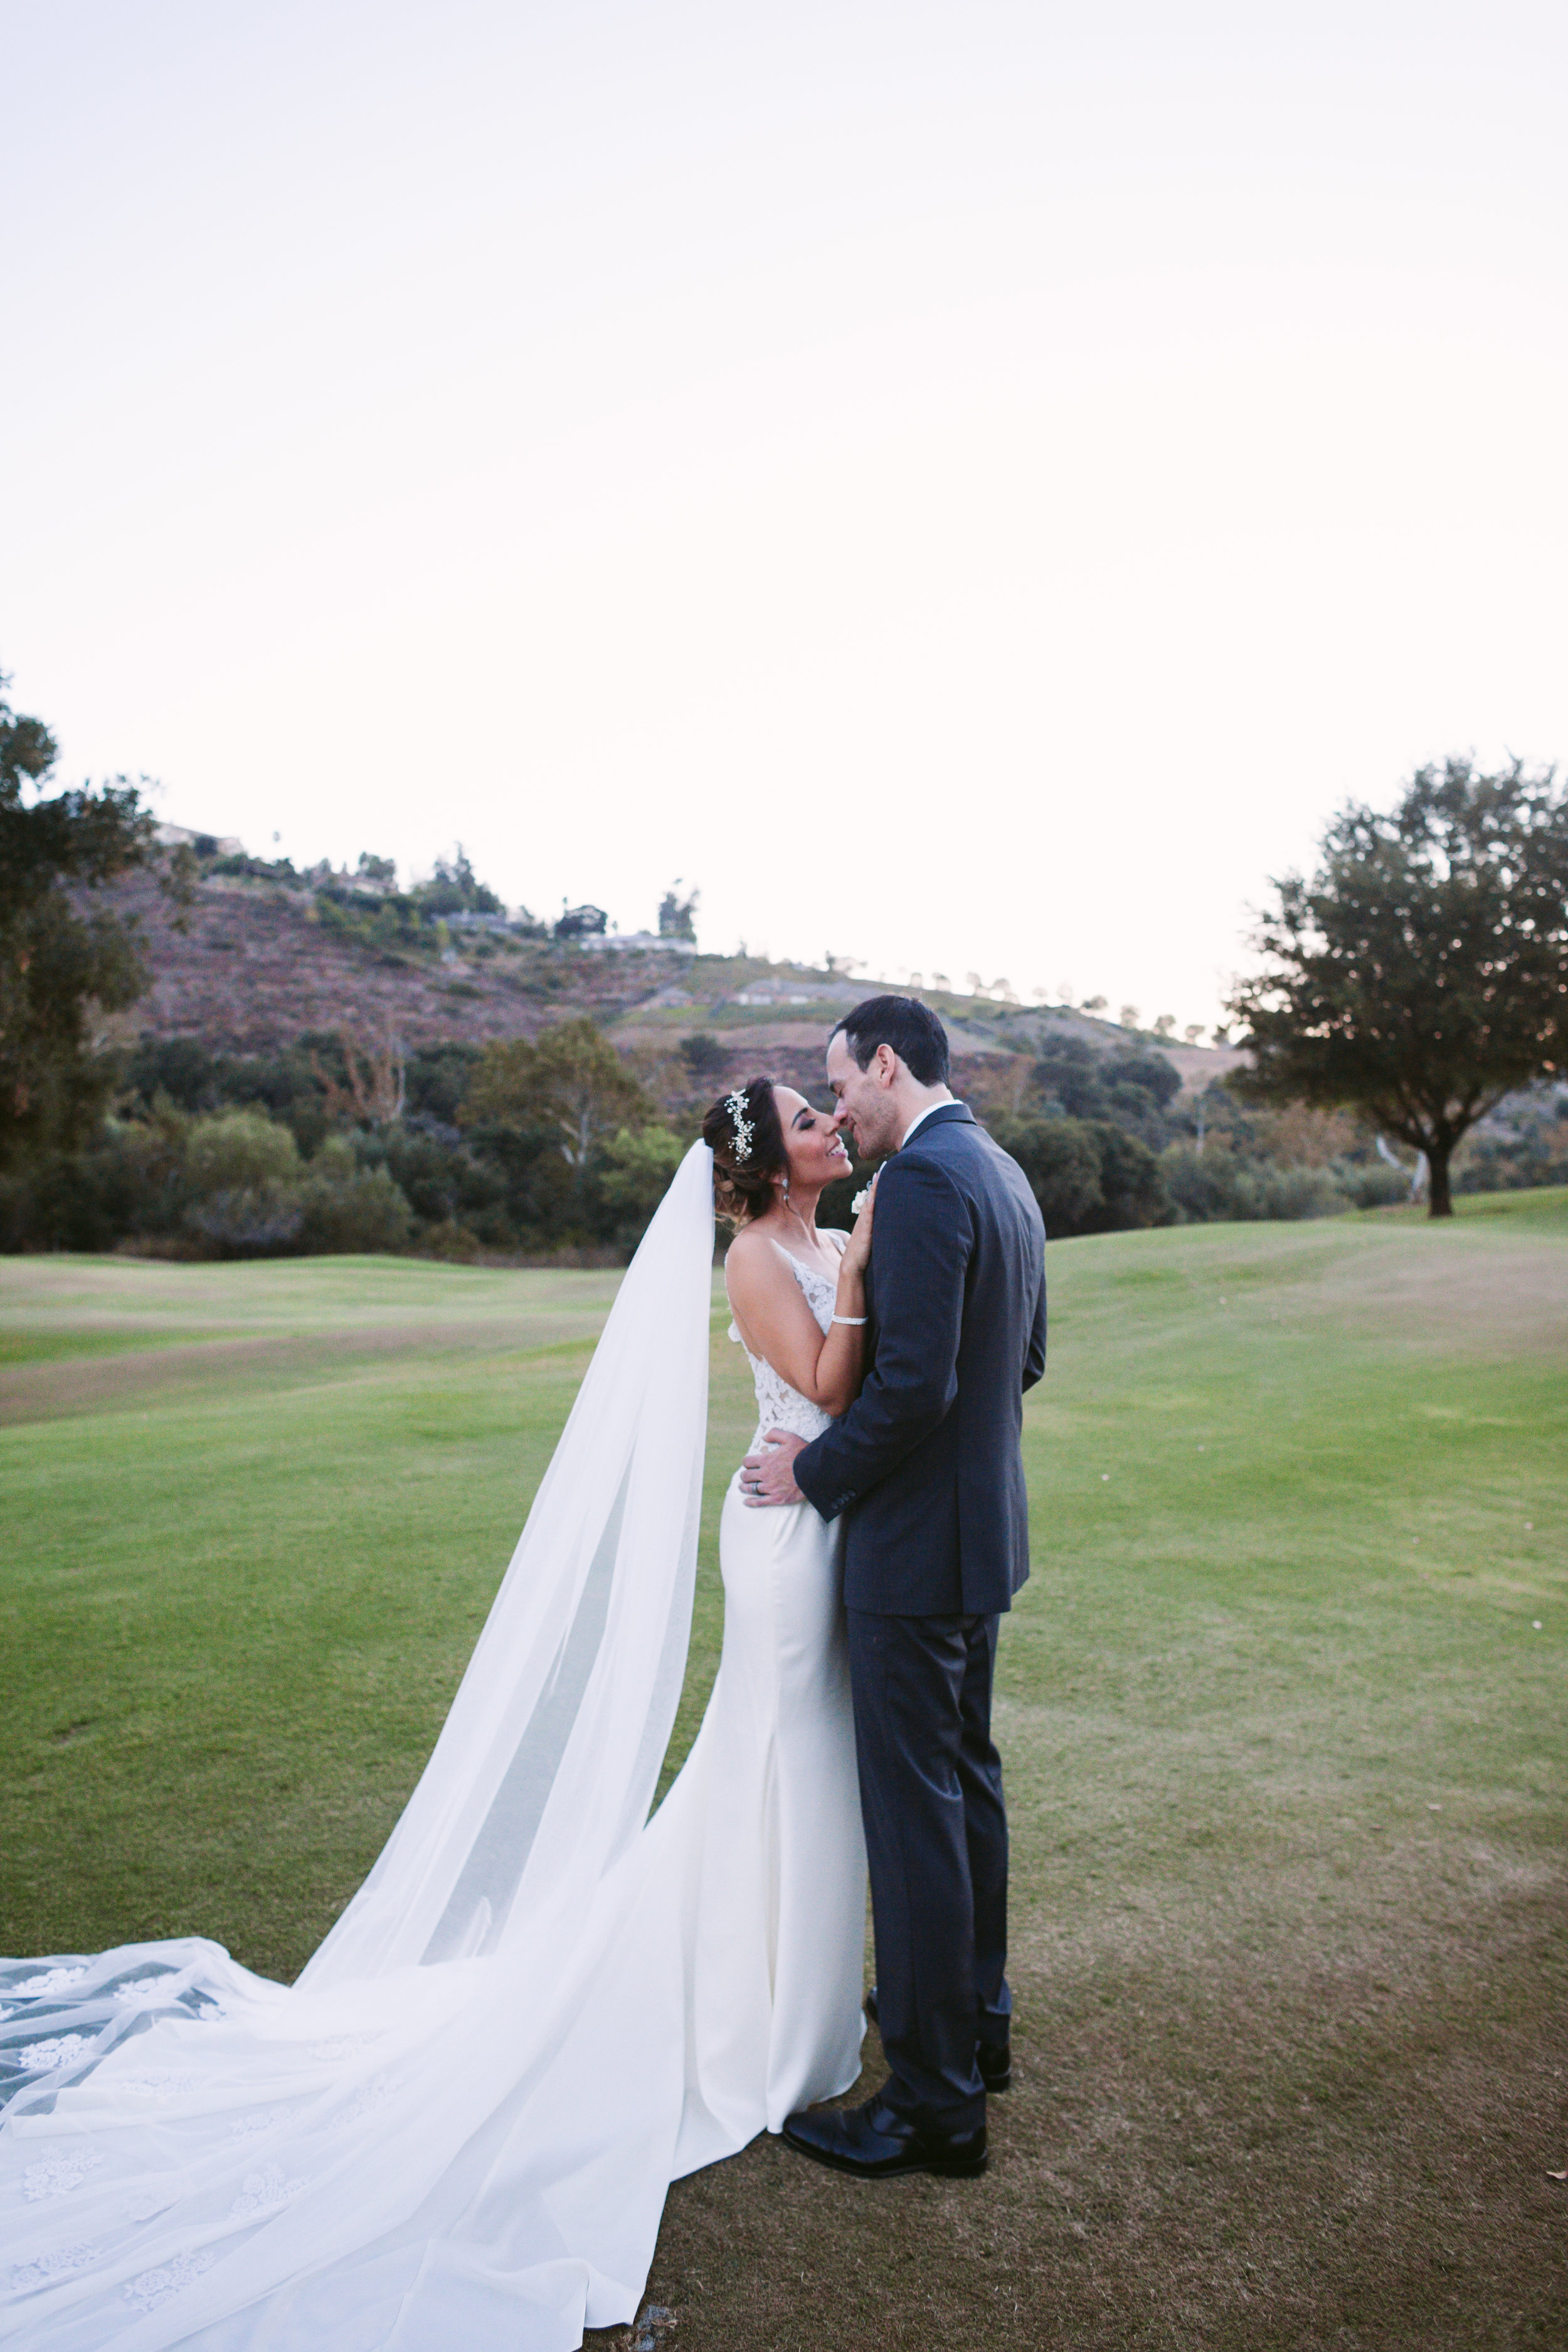 San Diego Wedding and Destination Wedding Photography Blessed Weddings 129.jpg